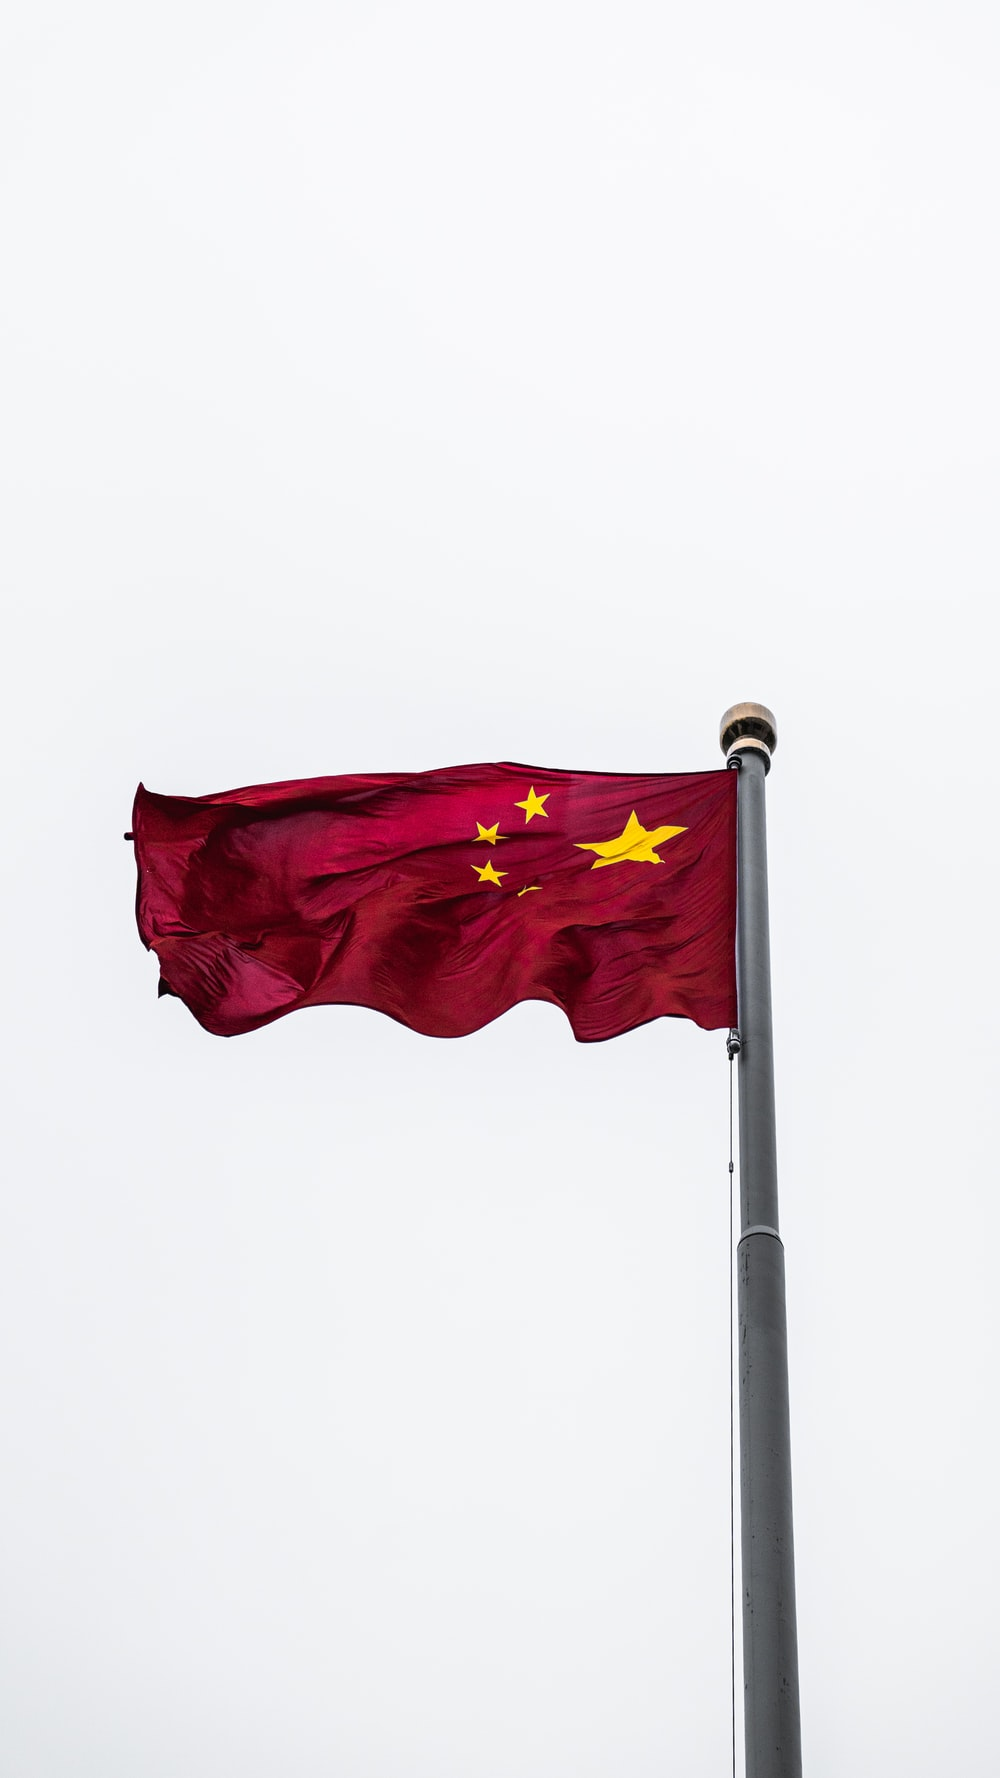 red national flag